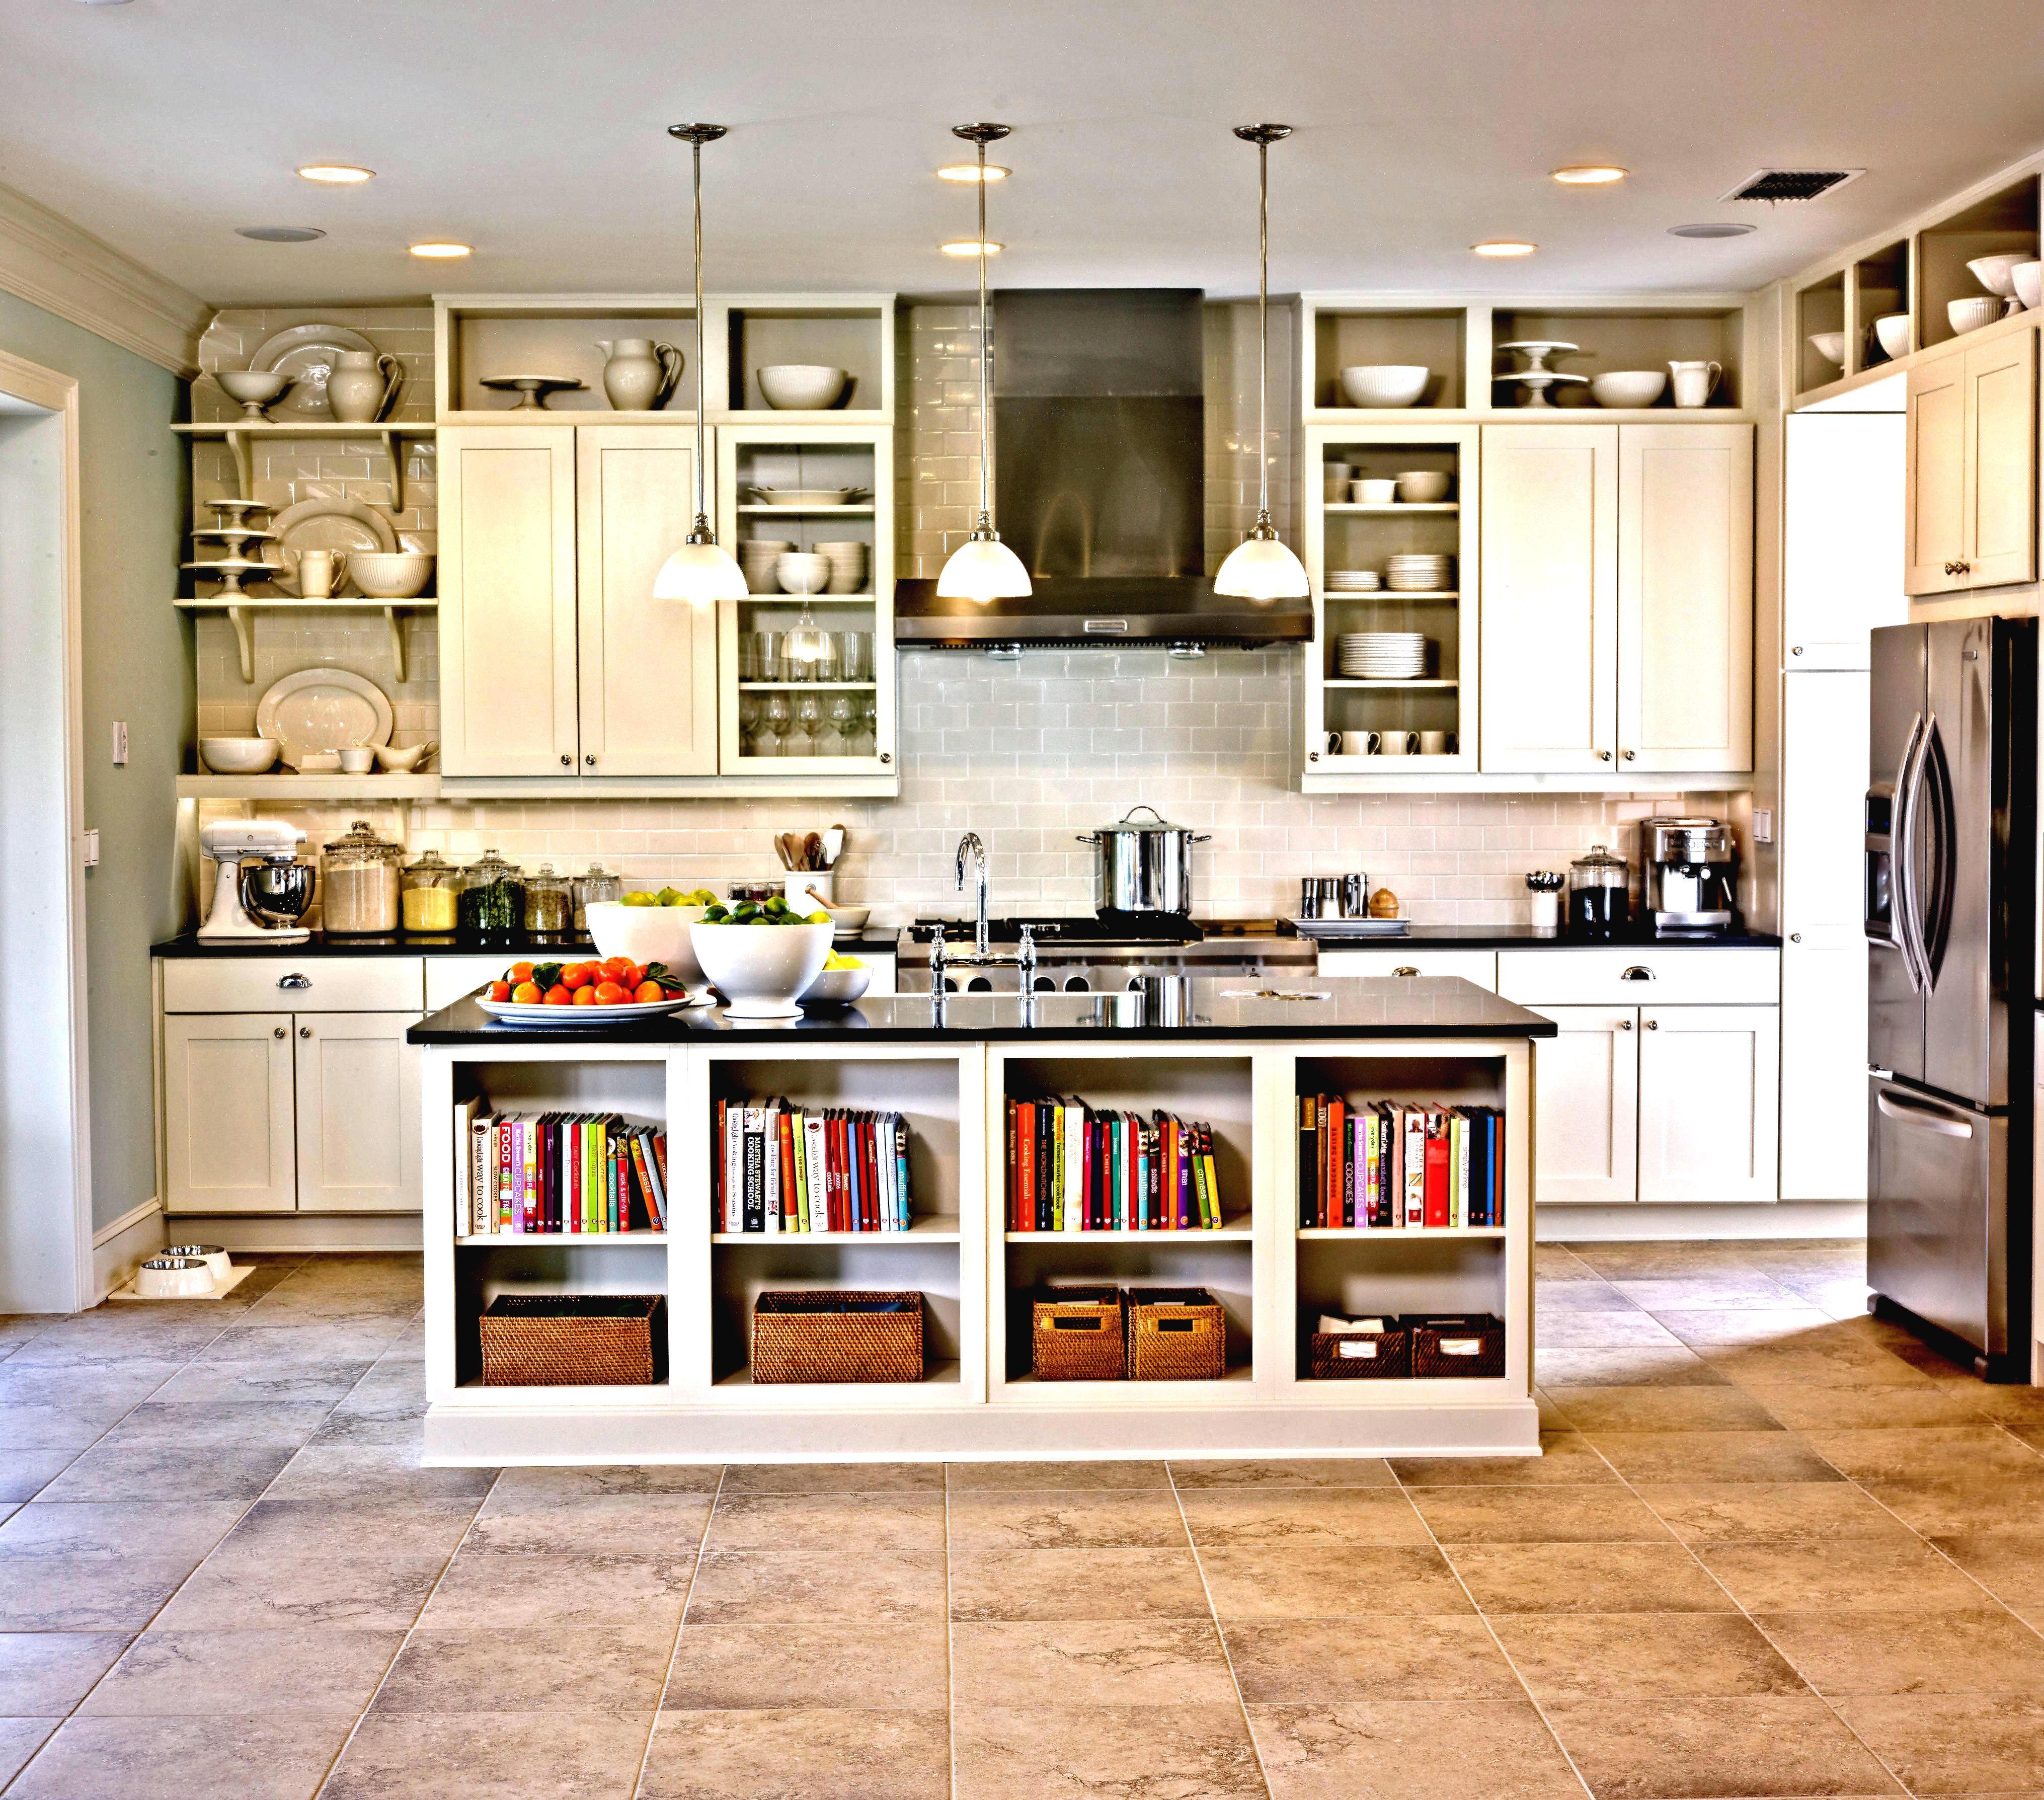 Kitchens Idea Open Shelves In Kitchen Amazing Kitchens Designs Idea Http